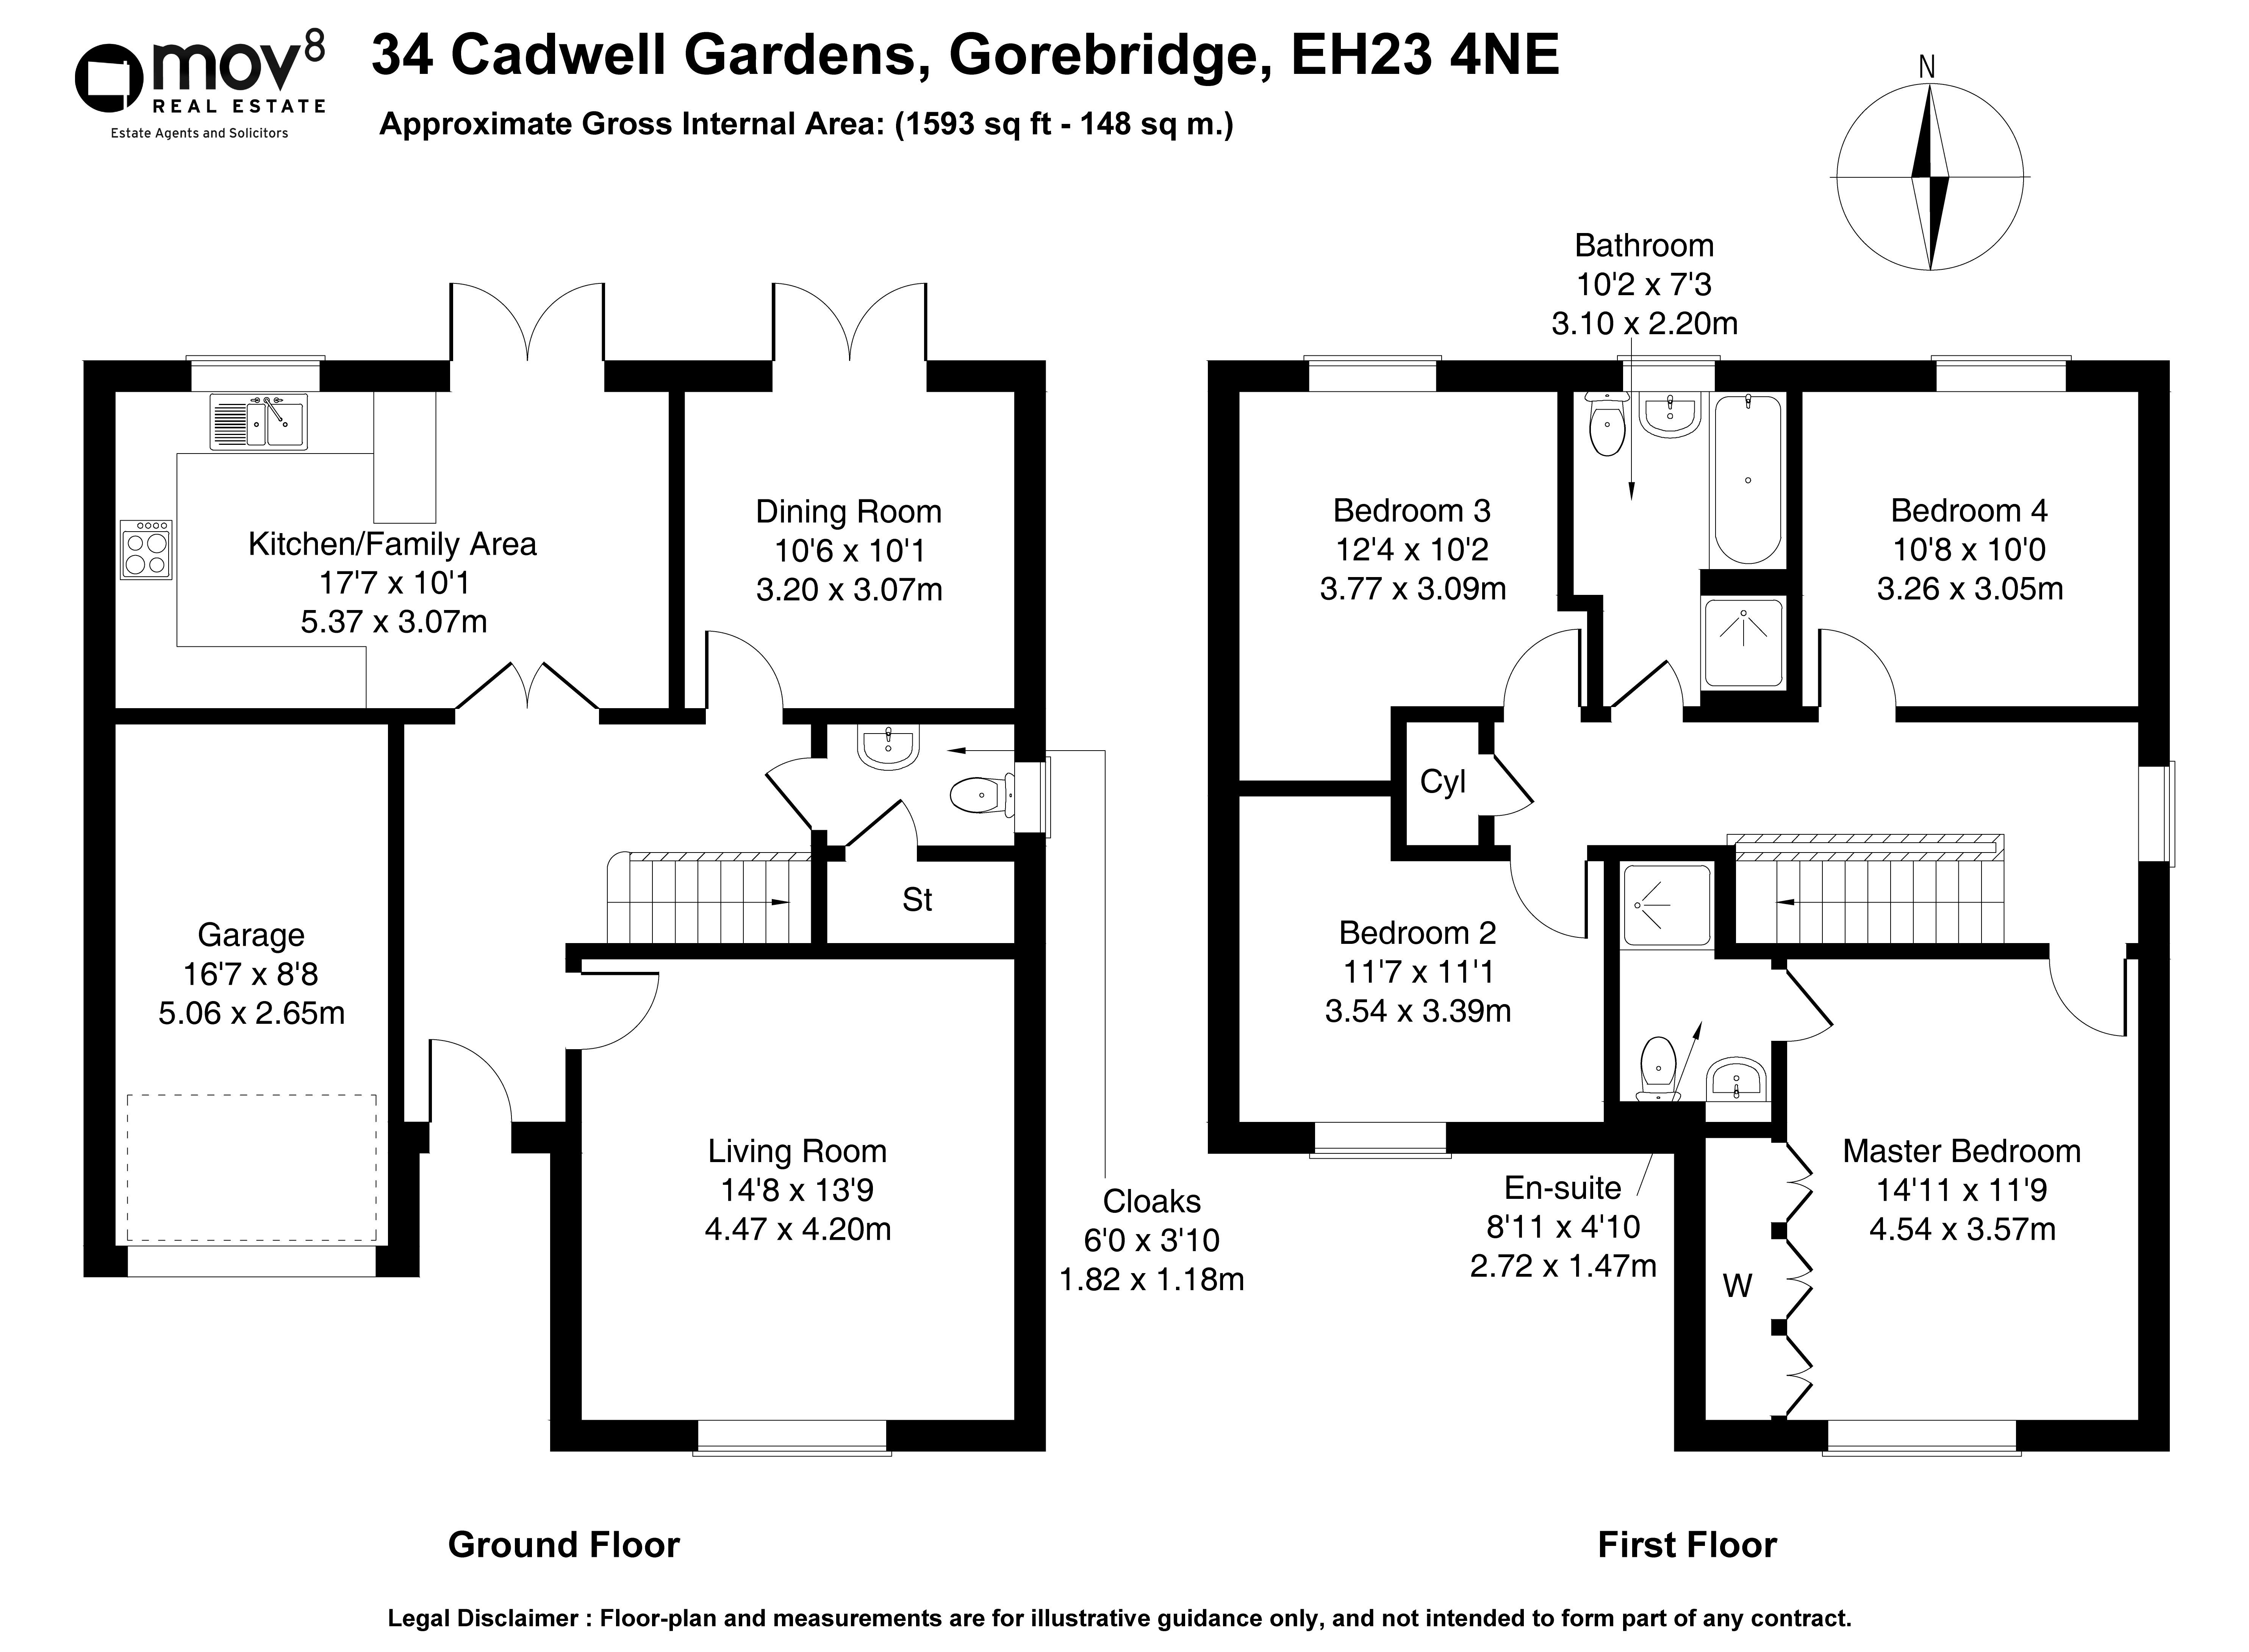 Floorplan 1 of 34 Cadwell Gardens, Gorebridge, Midlothian, EH23 4NE